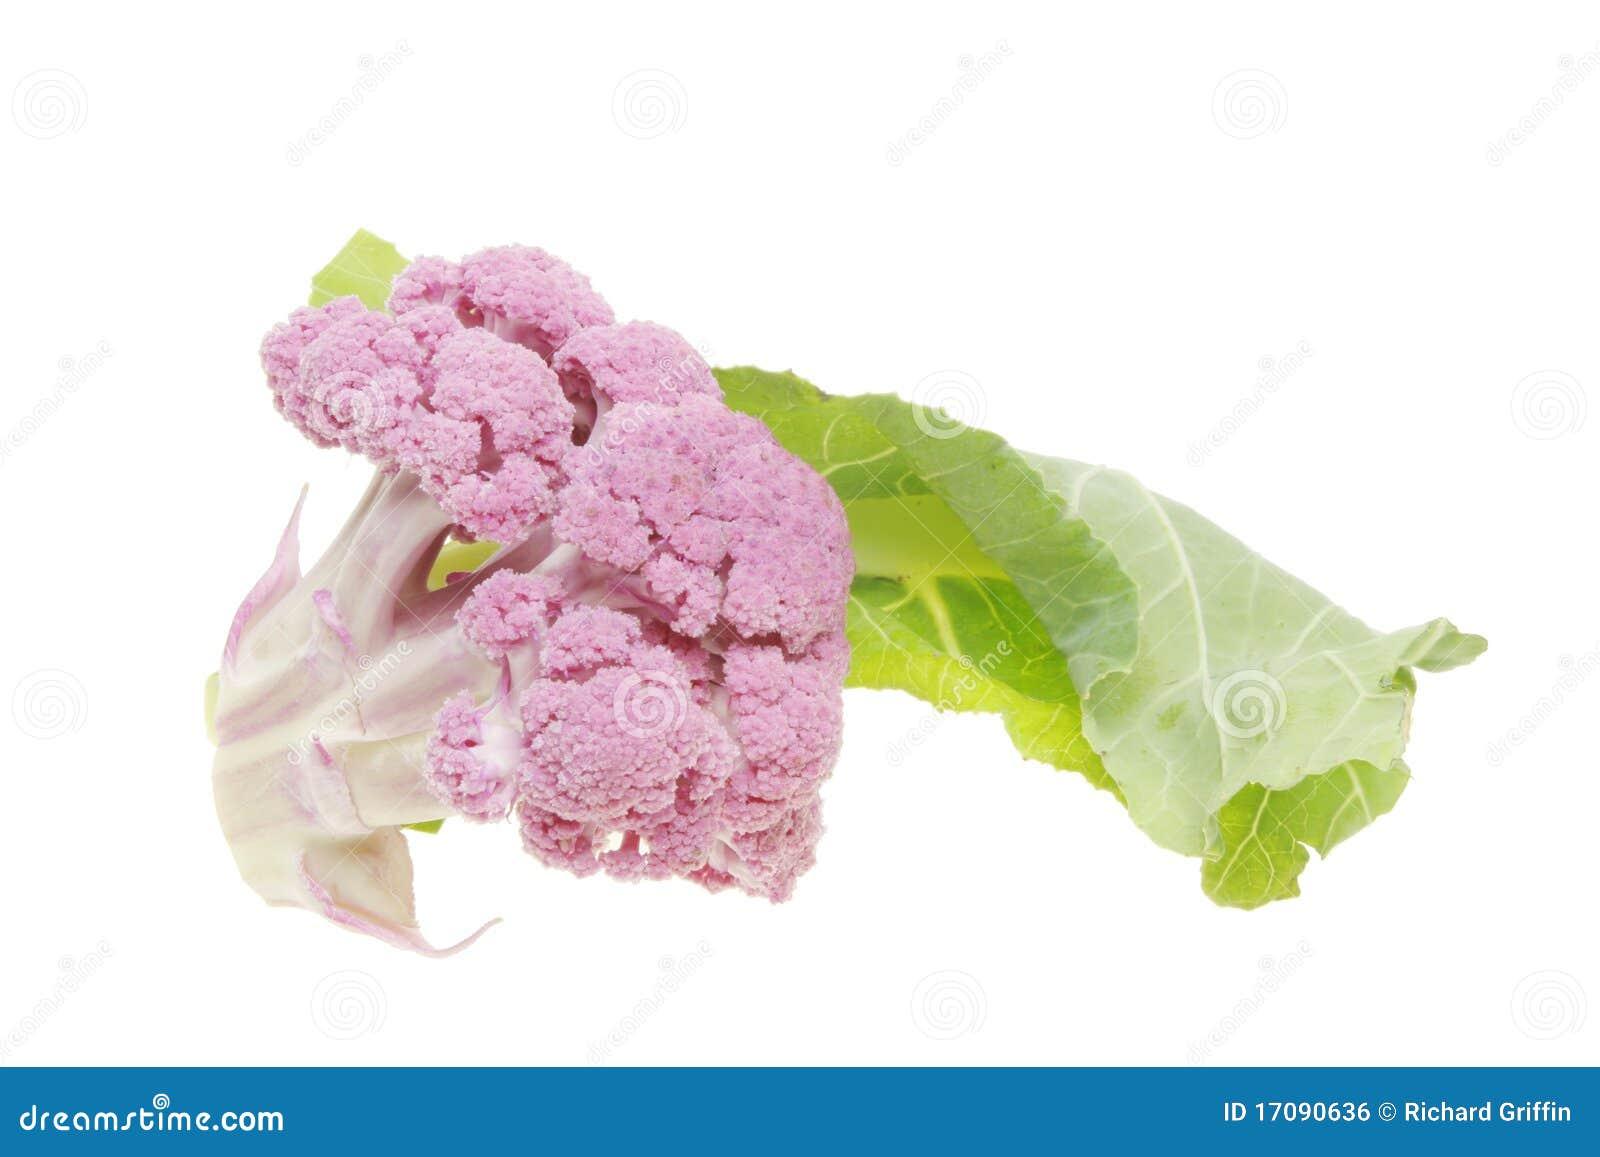 Purpurroter Blumenkohl und grünes Blatt